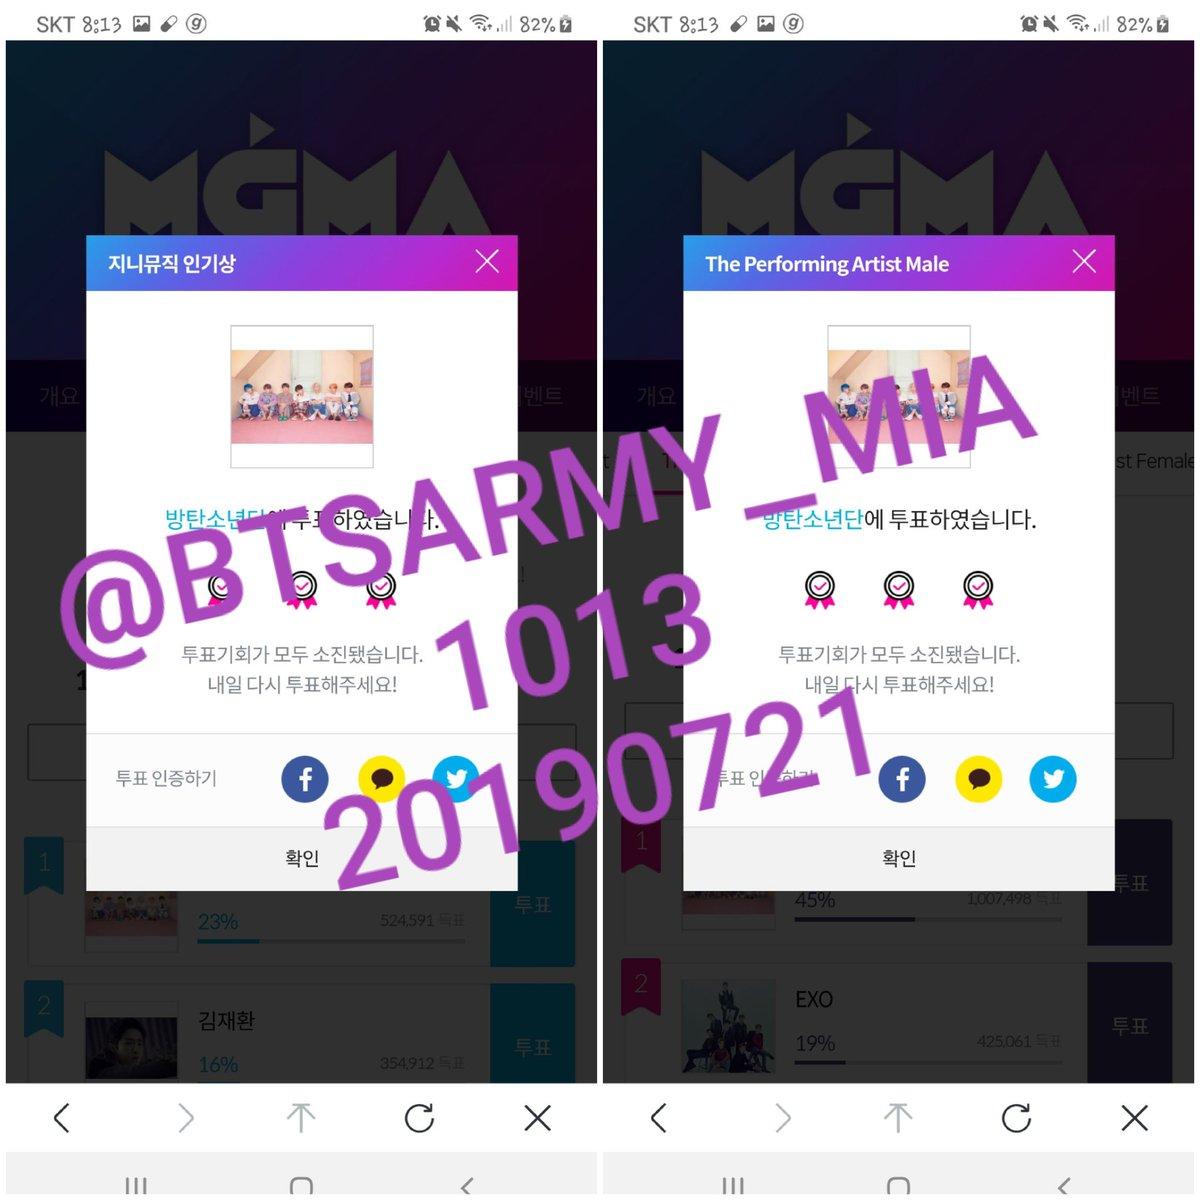 @BTS_KR_ARMY @BTS_twt #MGMAVOTE #방탄소년단 (@BTS_twt) 20190721 투표 인증